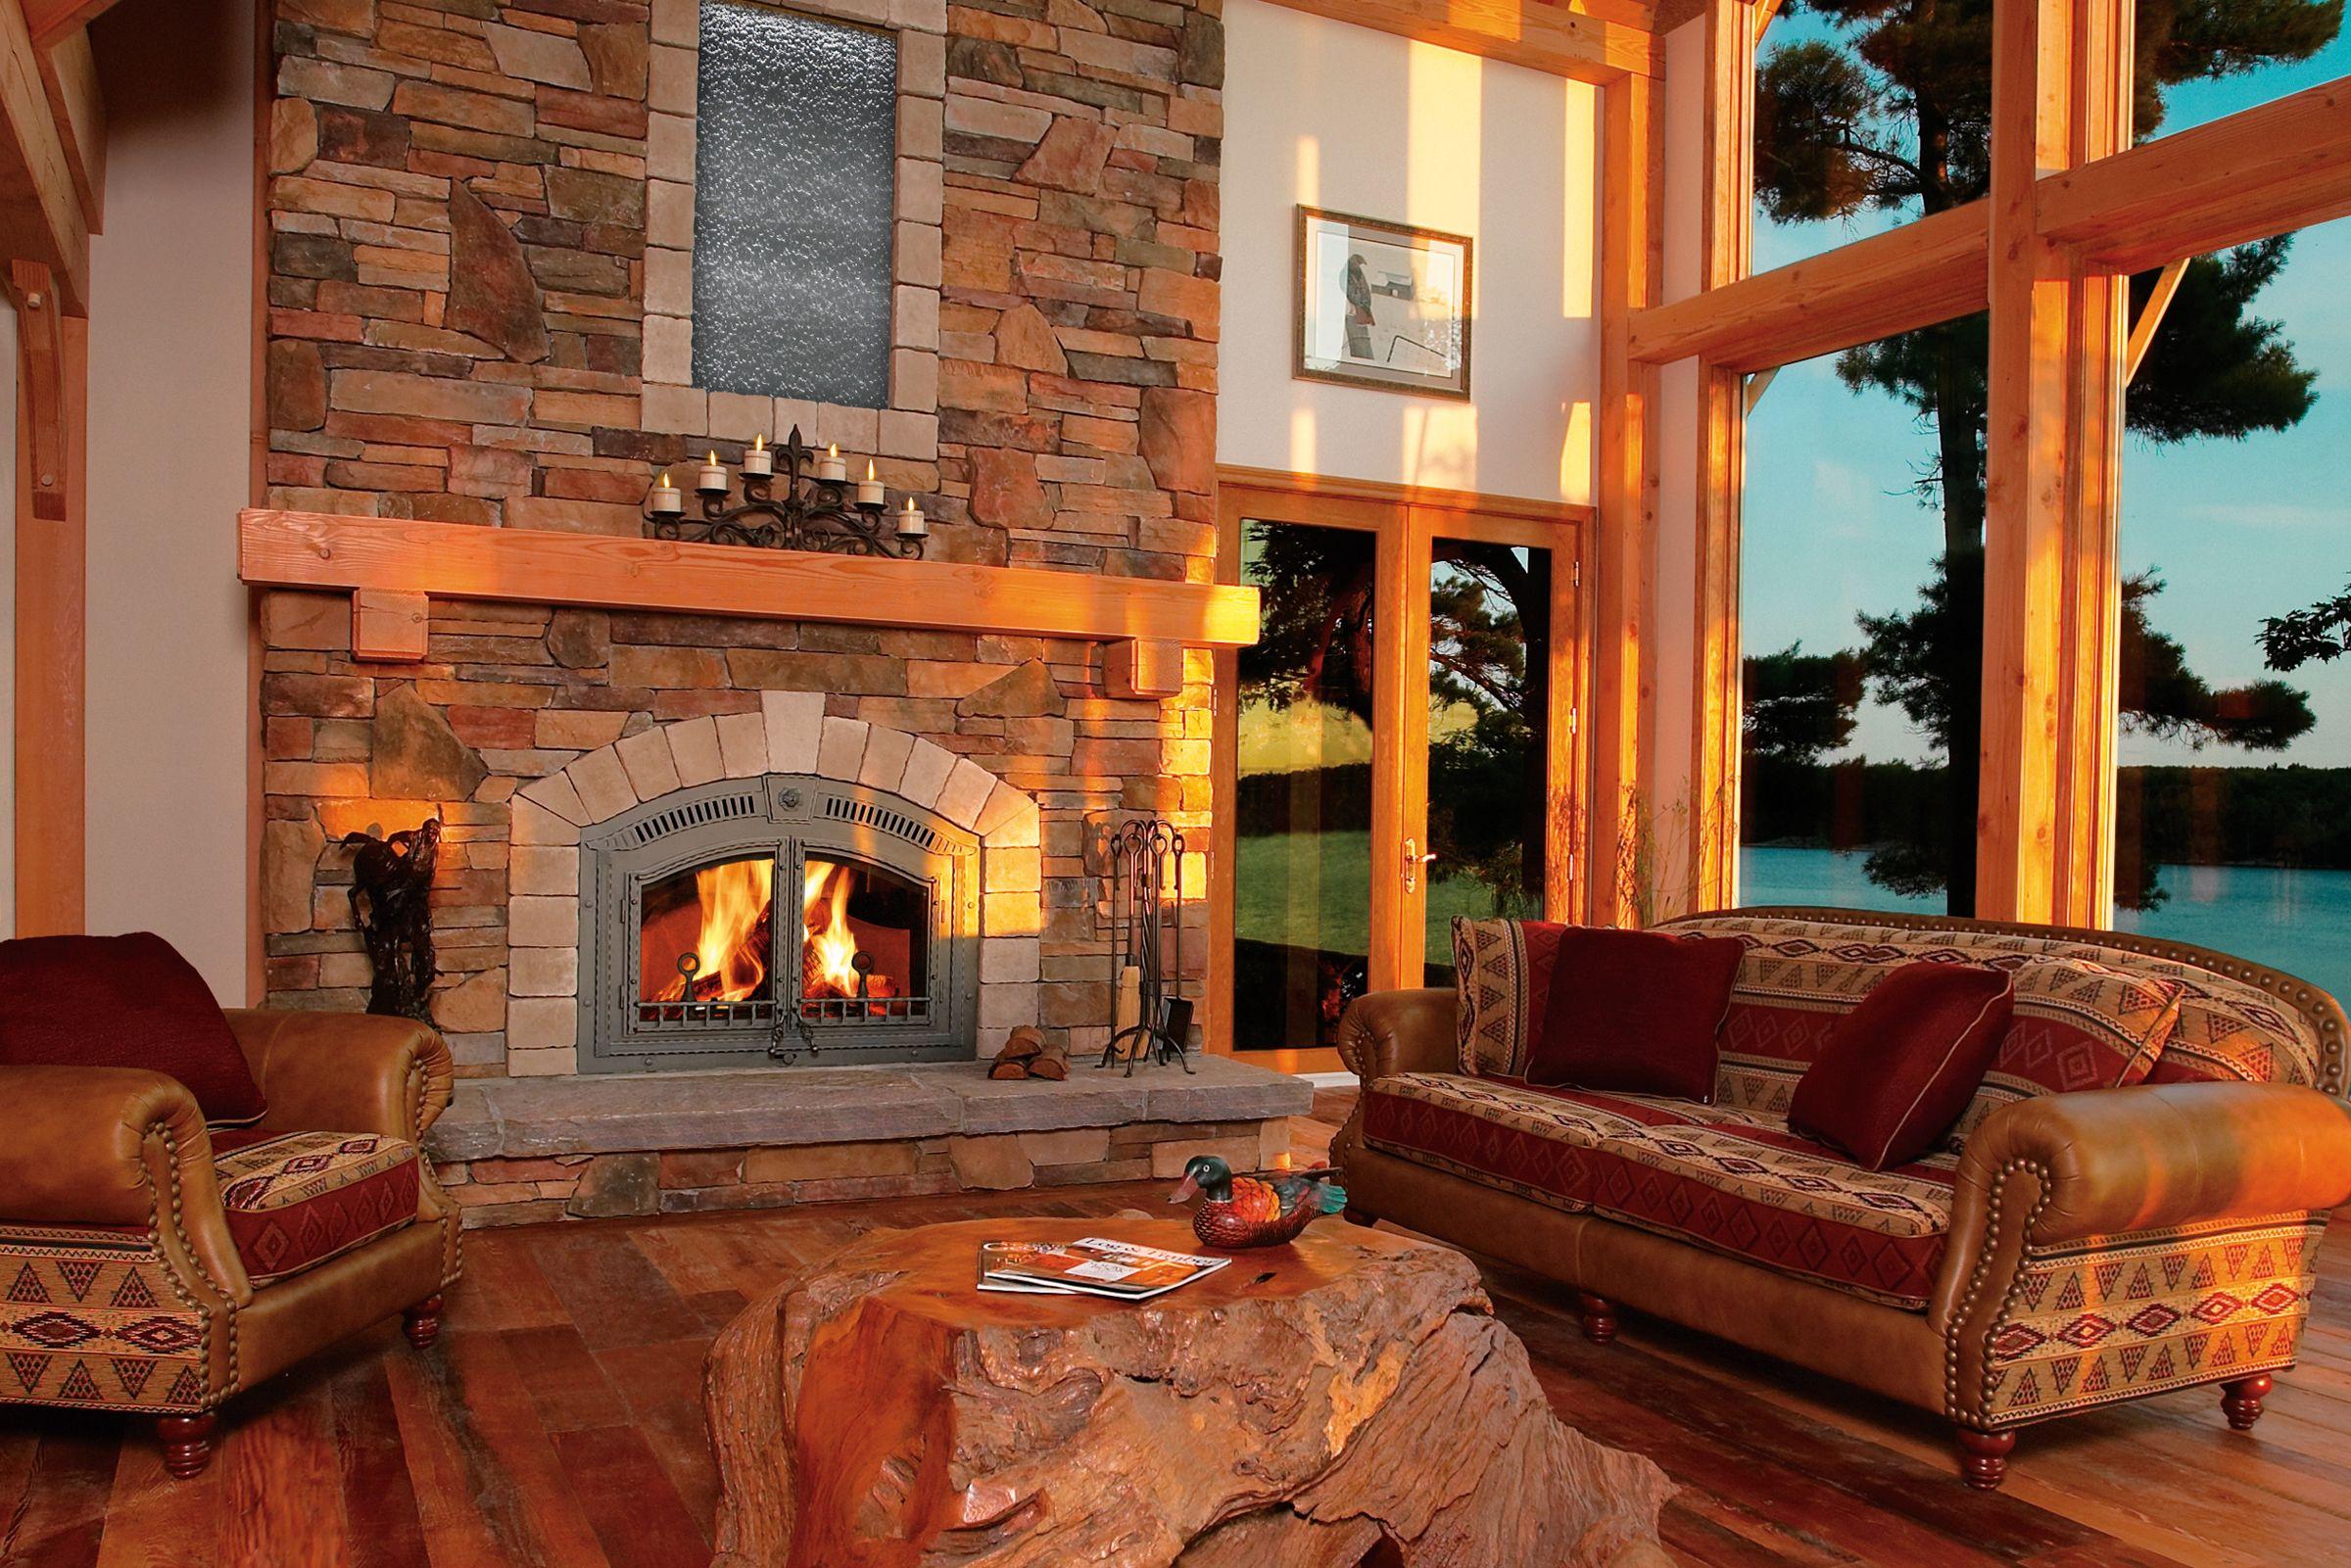 Beautiful rustic wood burning fireplace gas fireplace